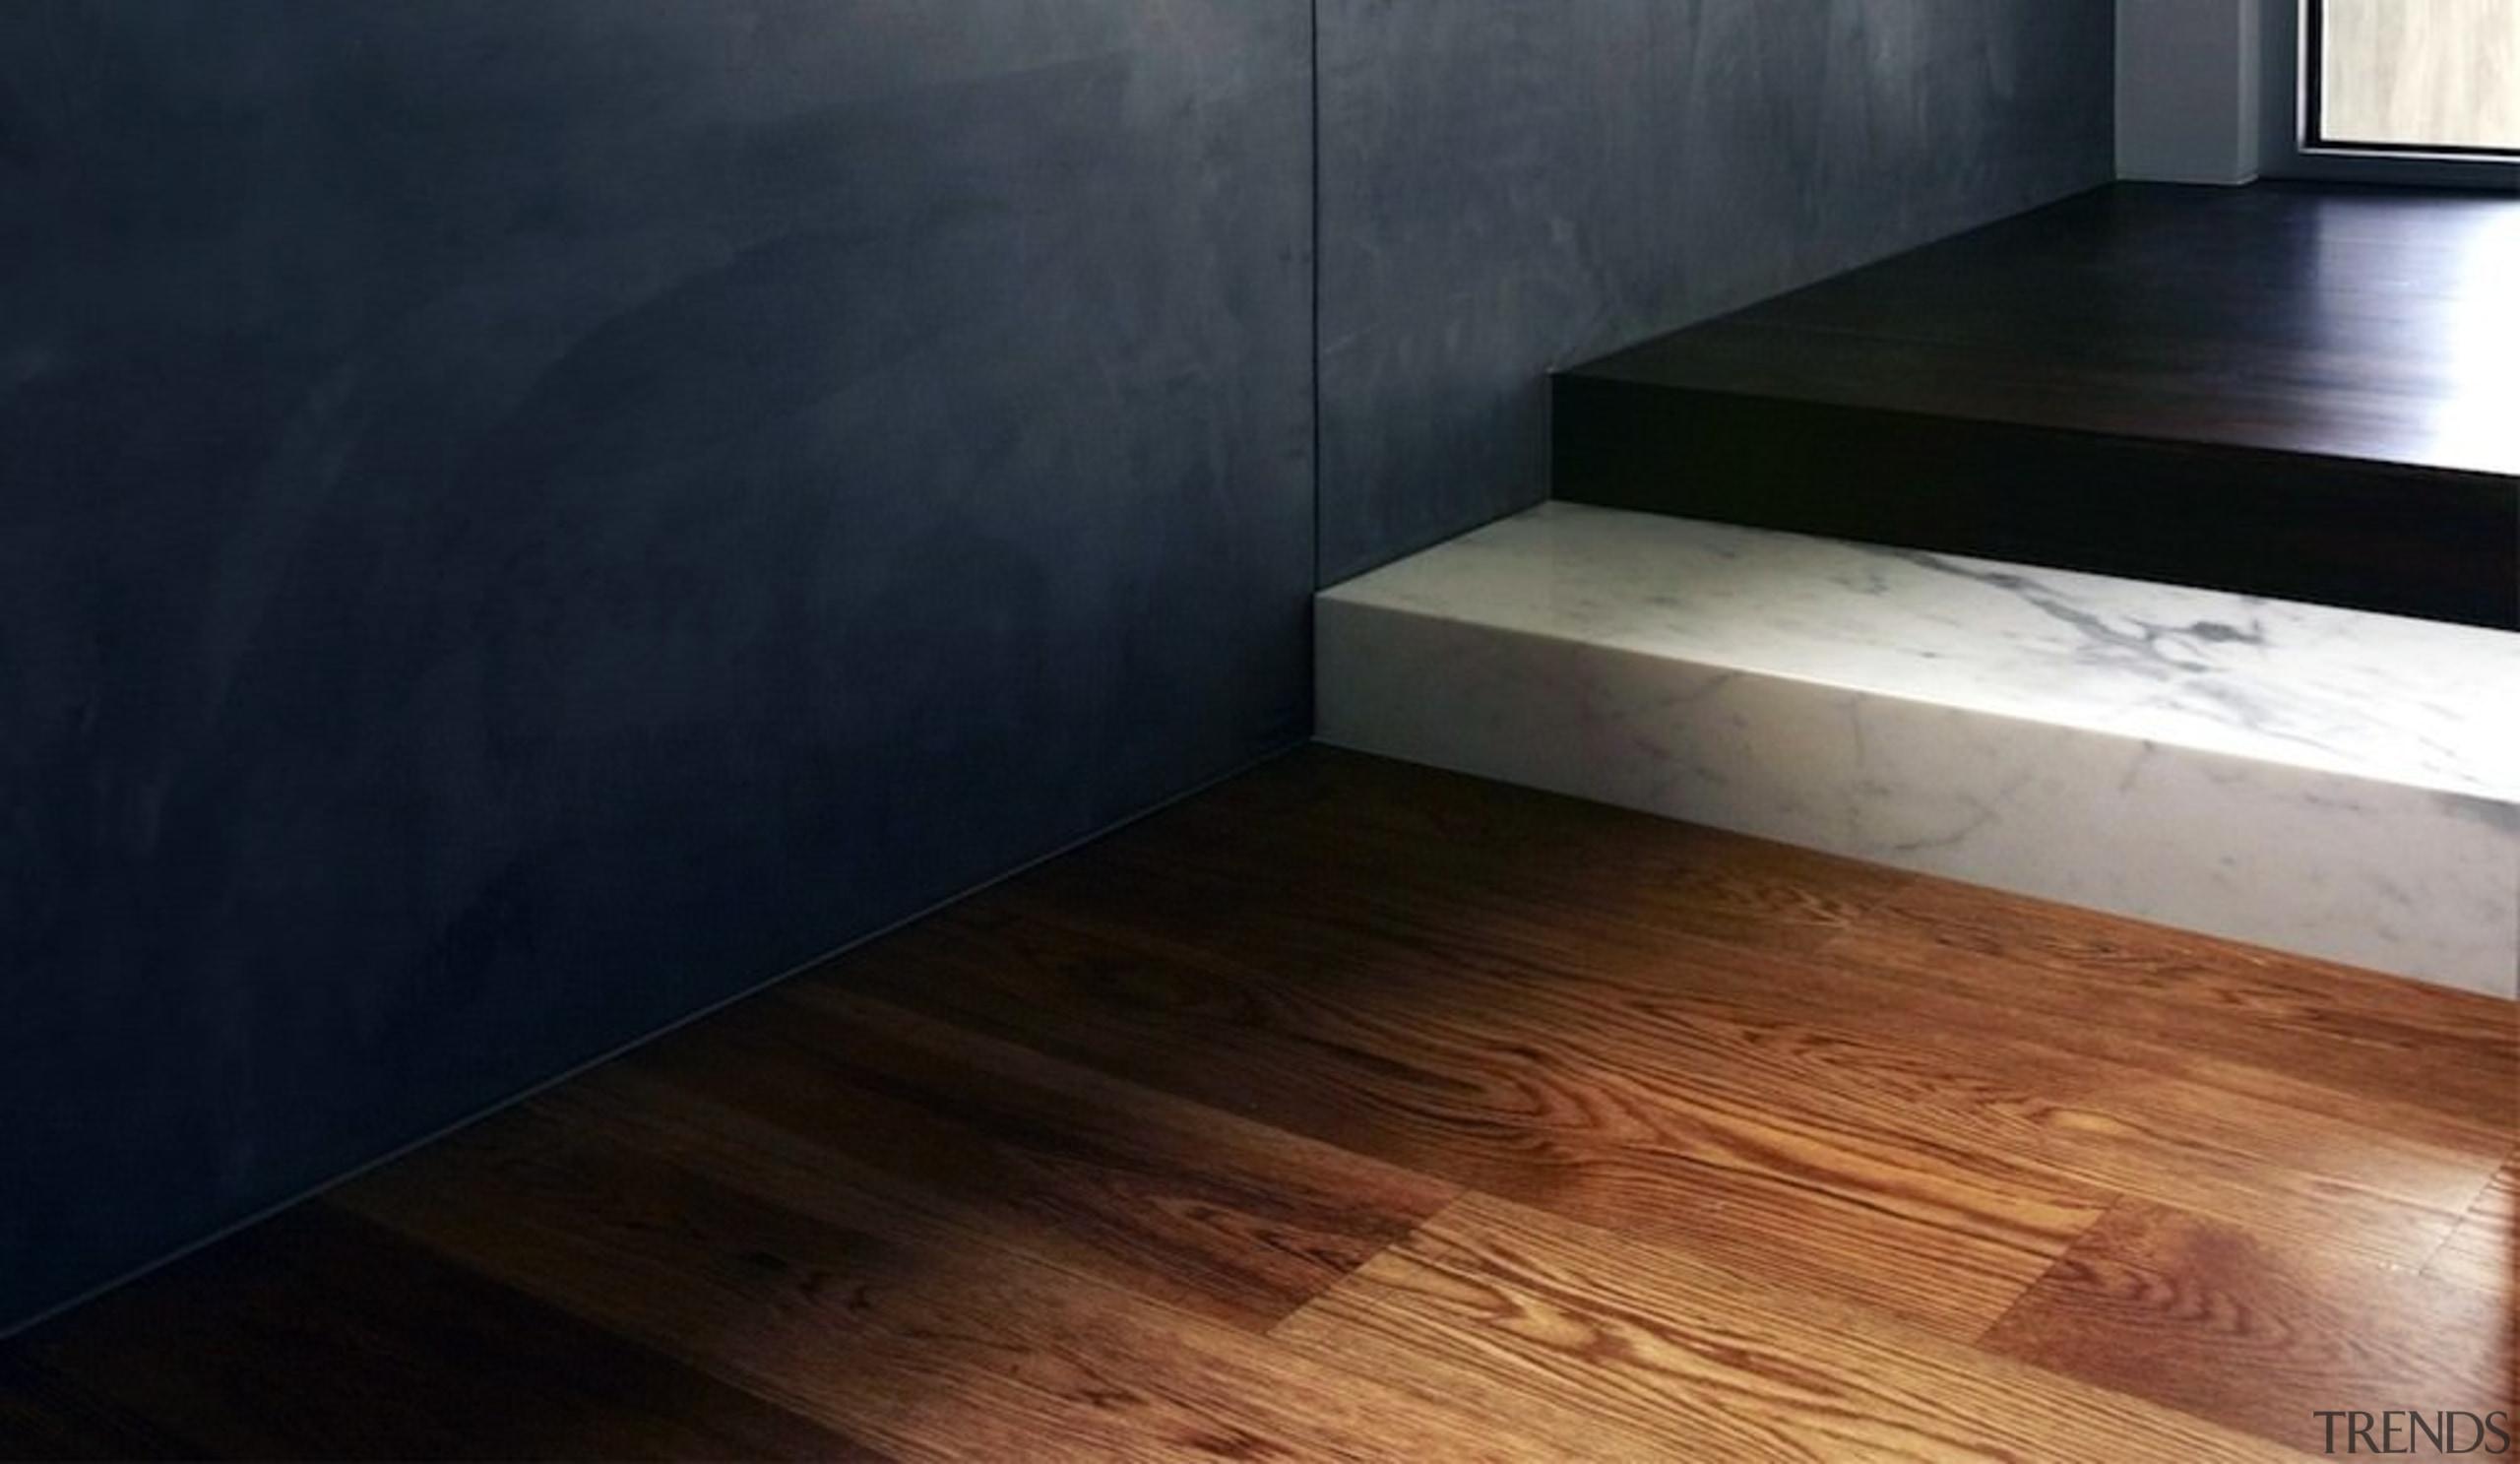 Contrasting materials meet here - Contrasting materials meet floor, flooring, hardwood, laminate flooring, property, wood, wood flooring, wood stain, black